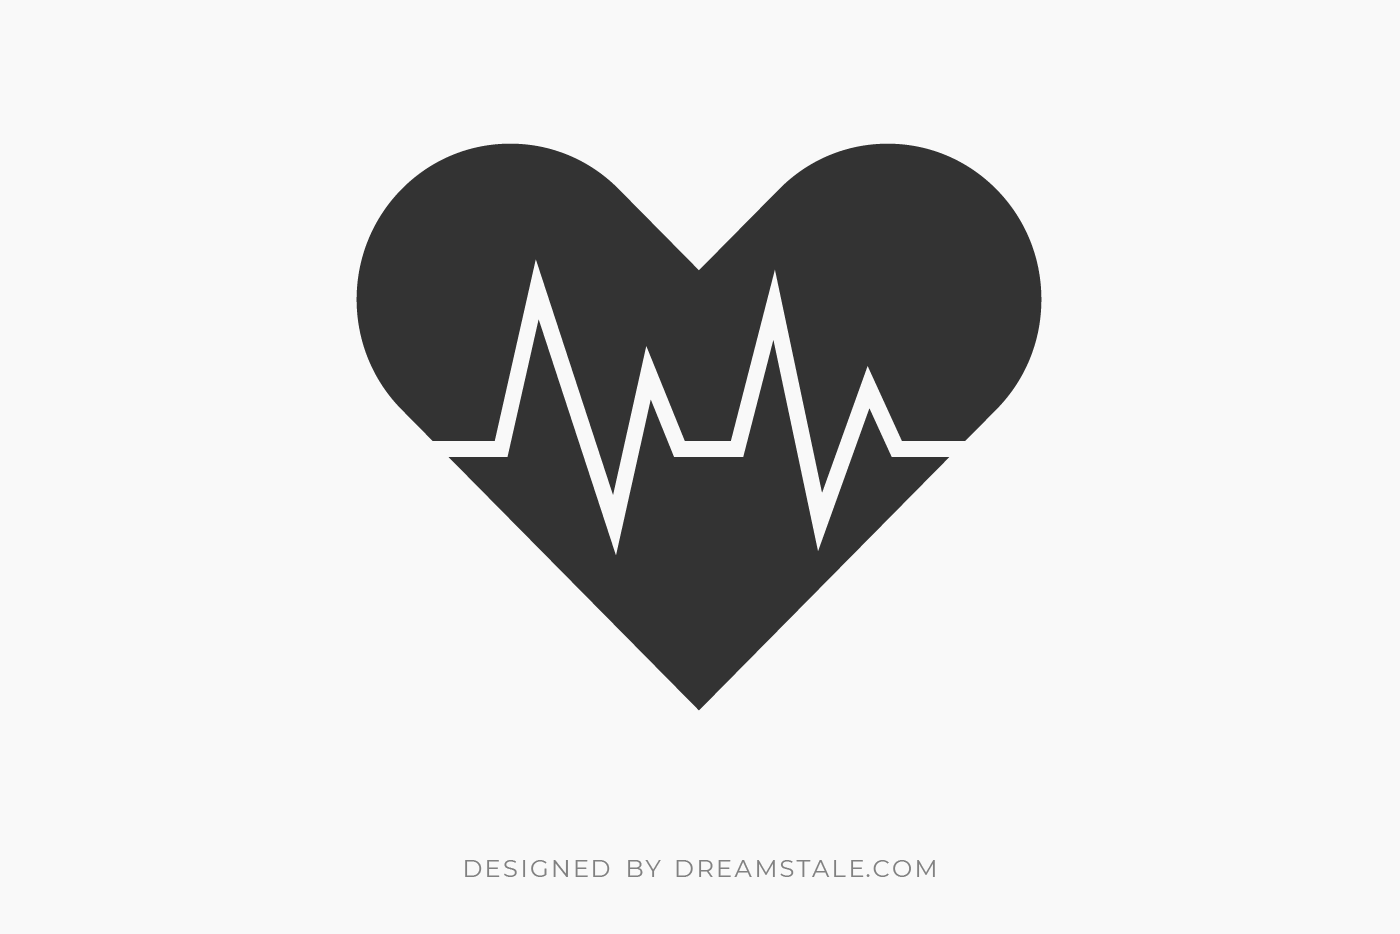 Heart Beat Clipart Free SVG